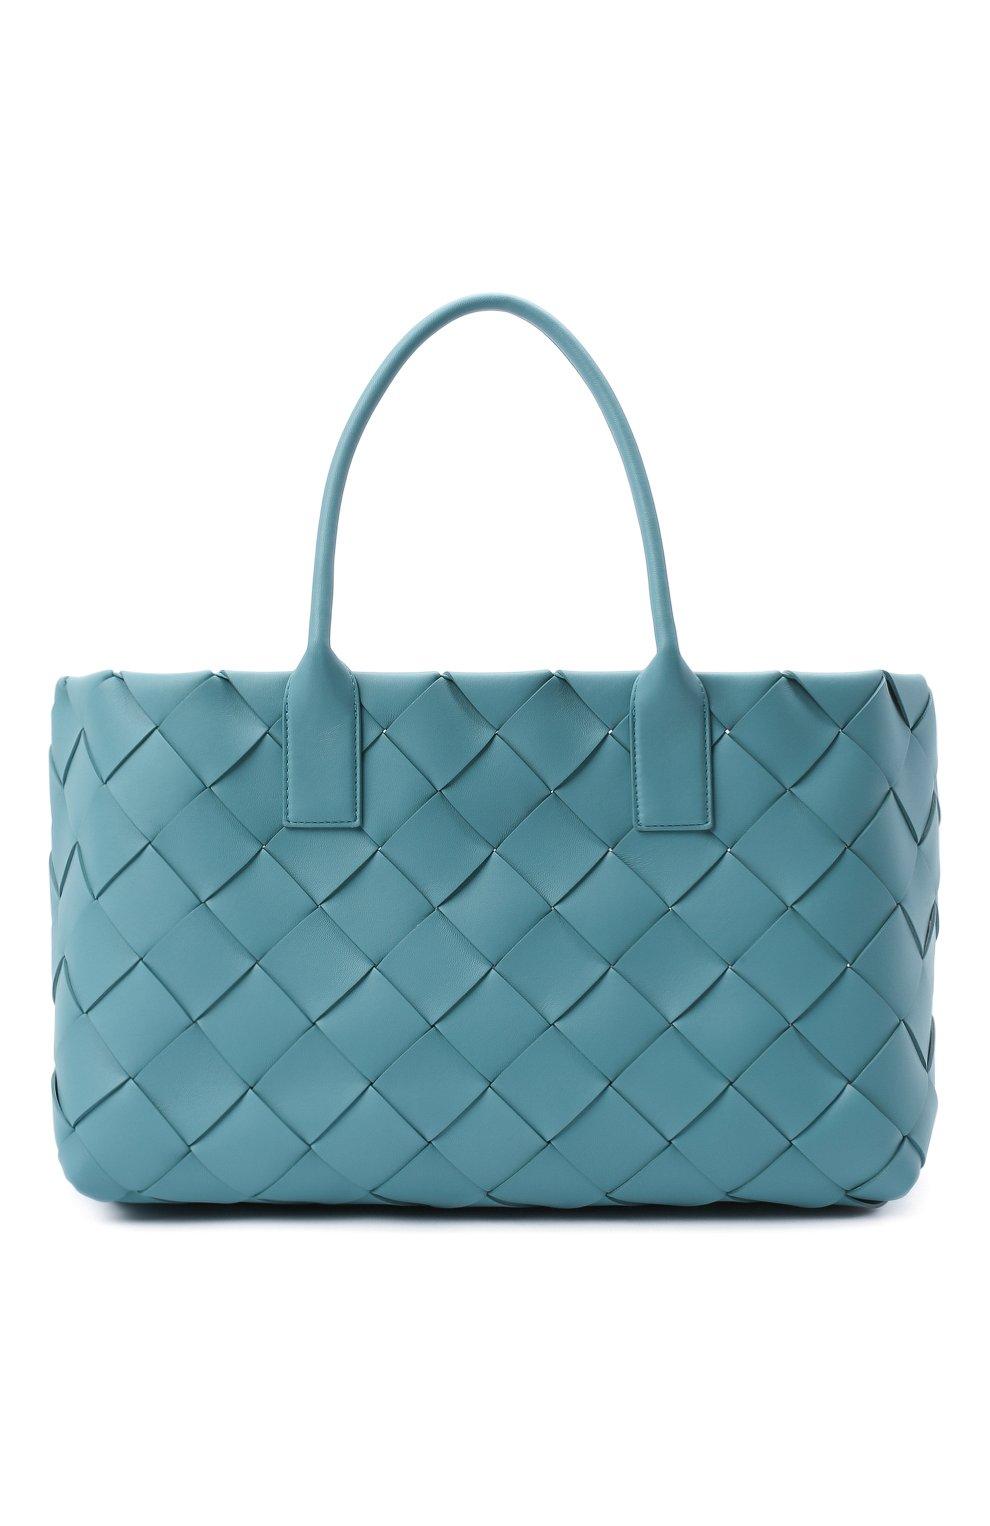 Женский сумка-тоут BOTTEGA VENETA голубого цвета, арт. 630817/VMAY3 | Фото 1